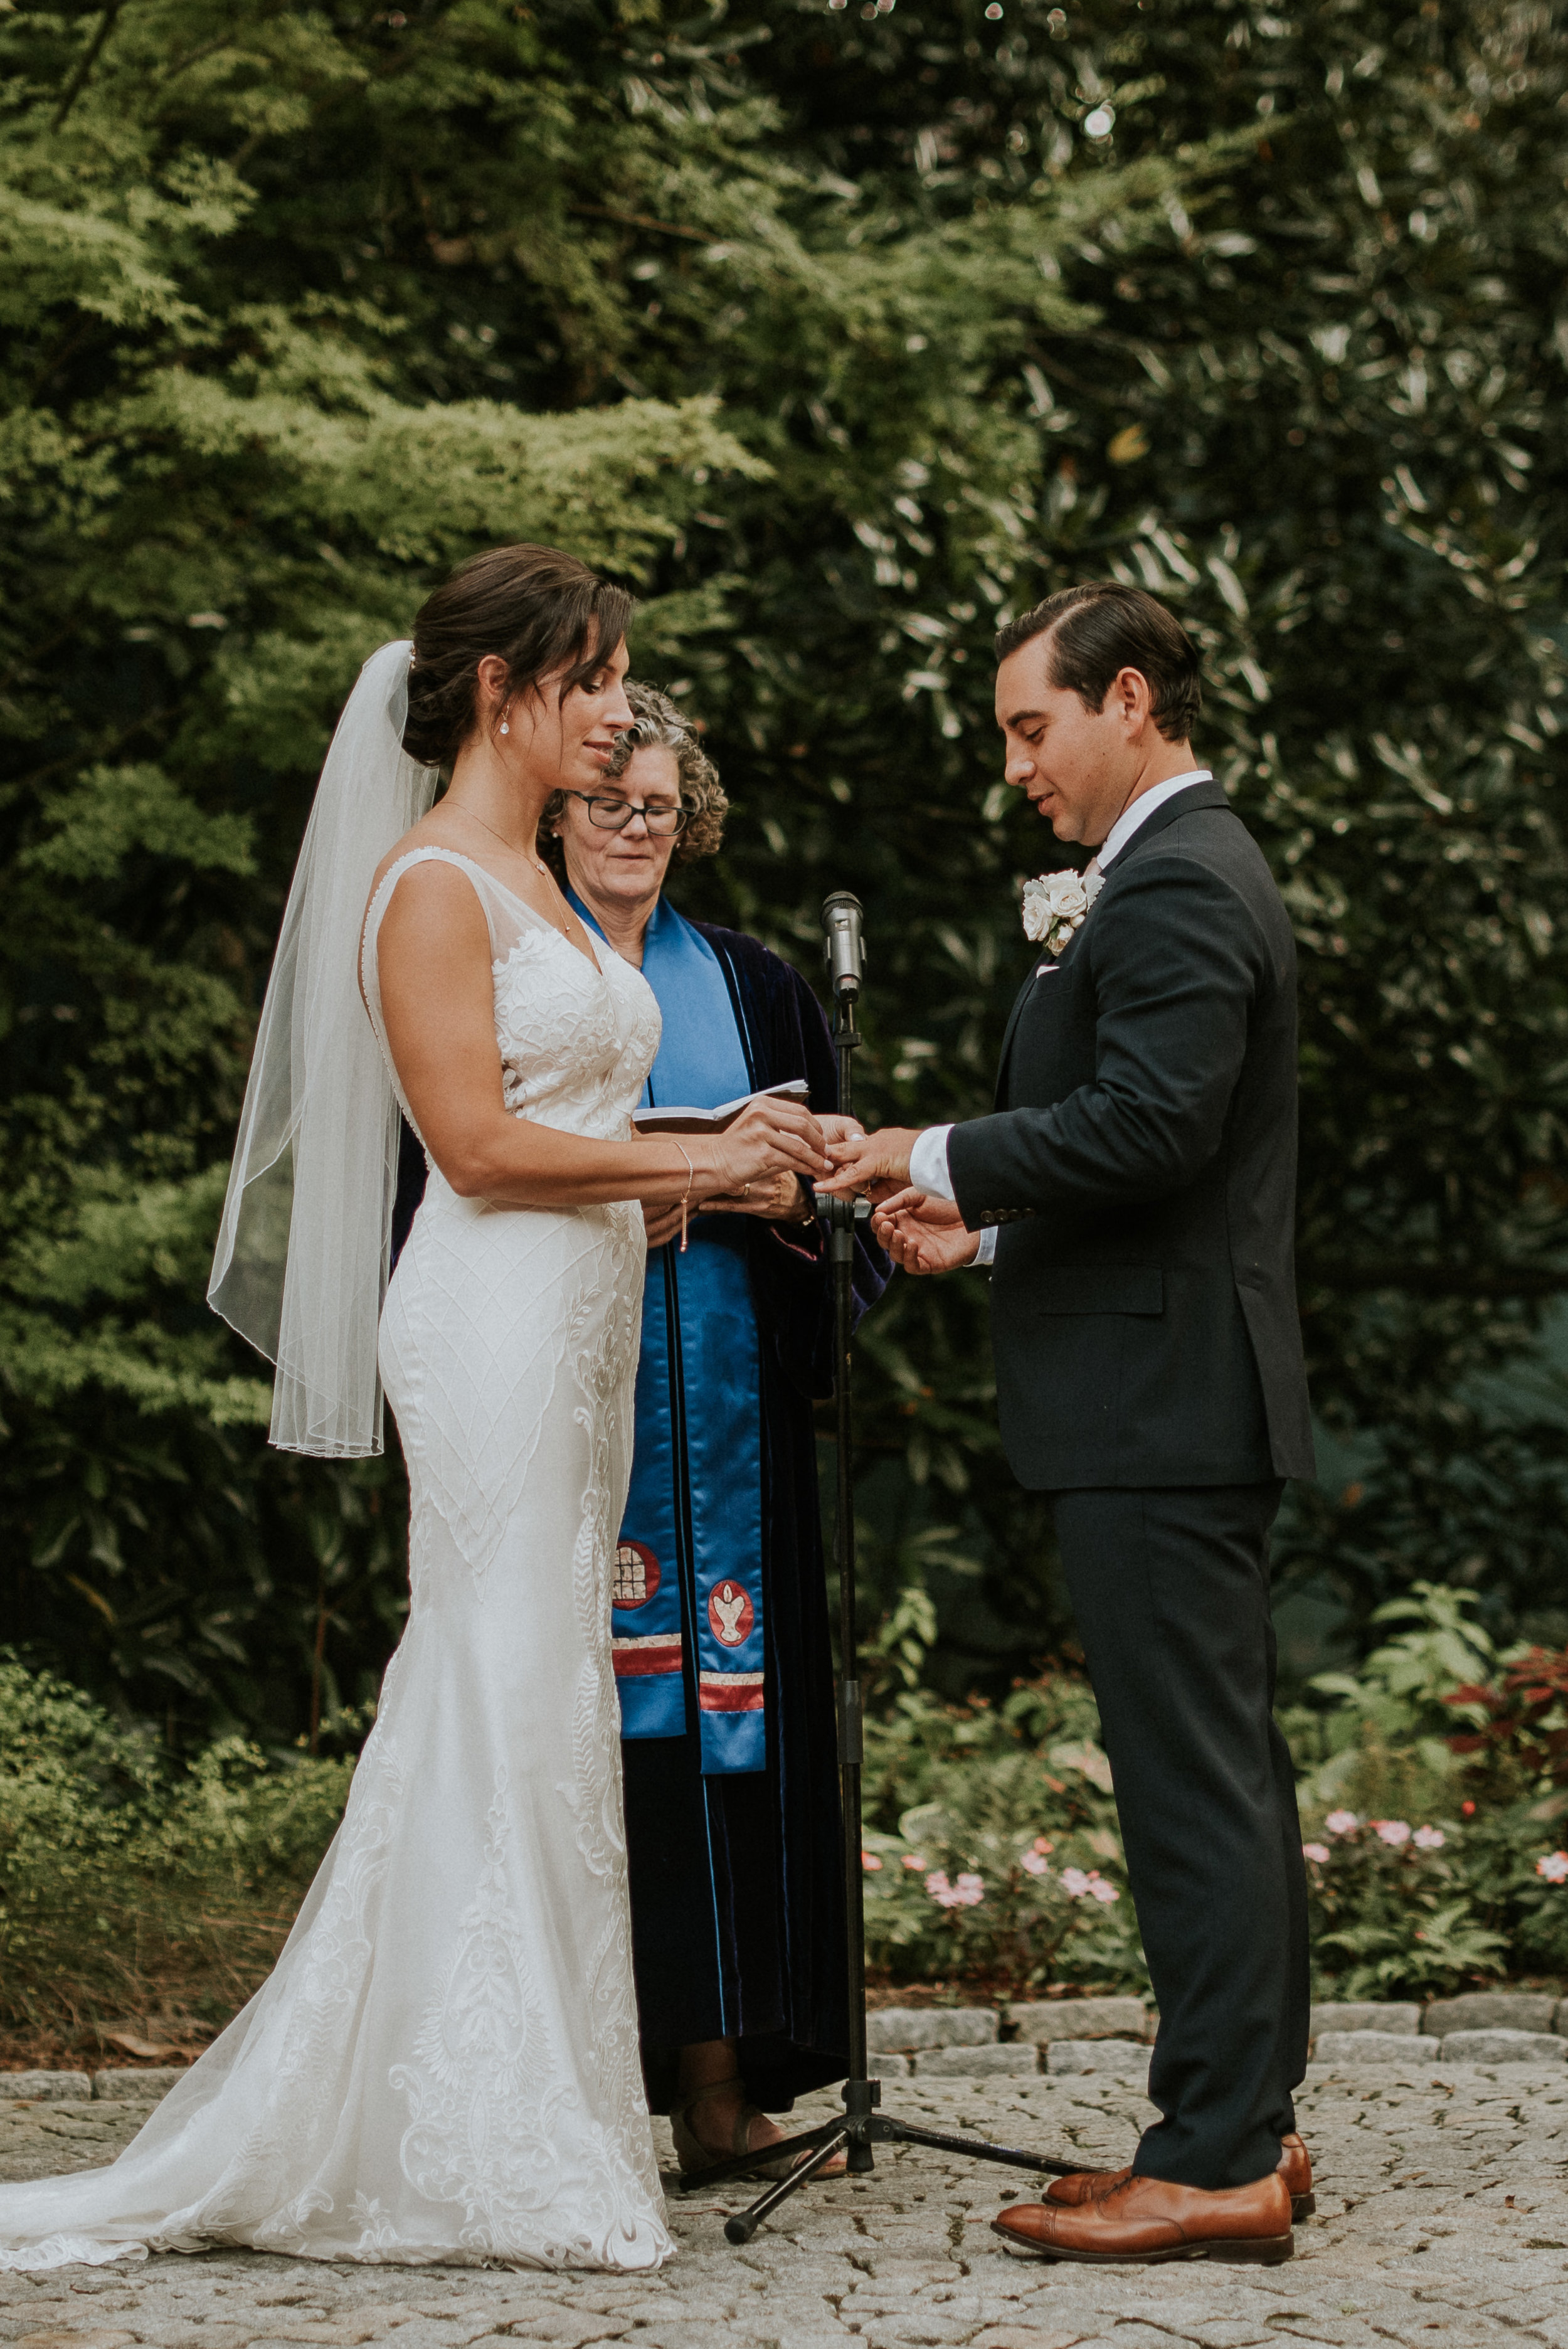 Wedding ceremony at The Trolley Barn in Atlanta, GA